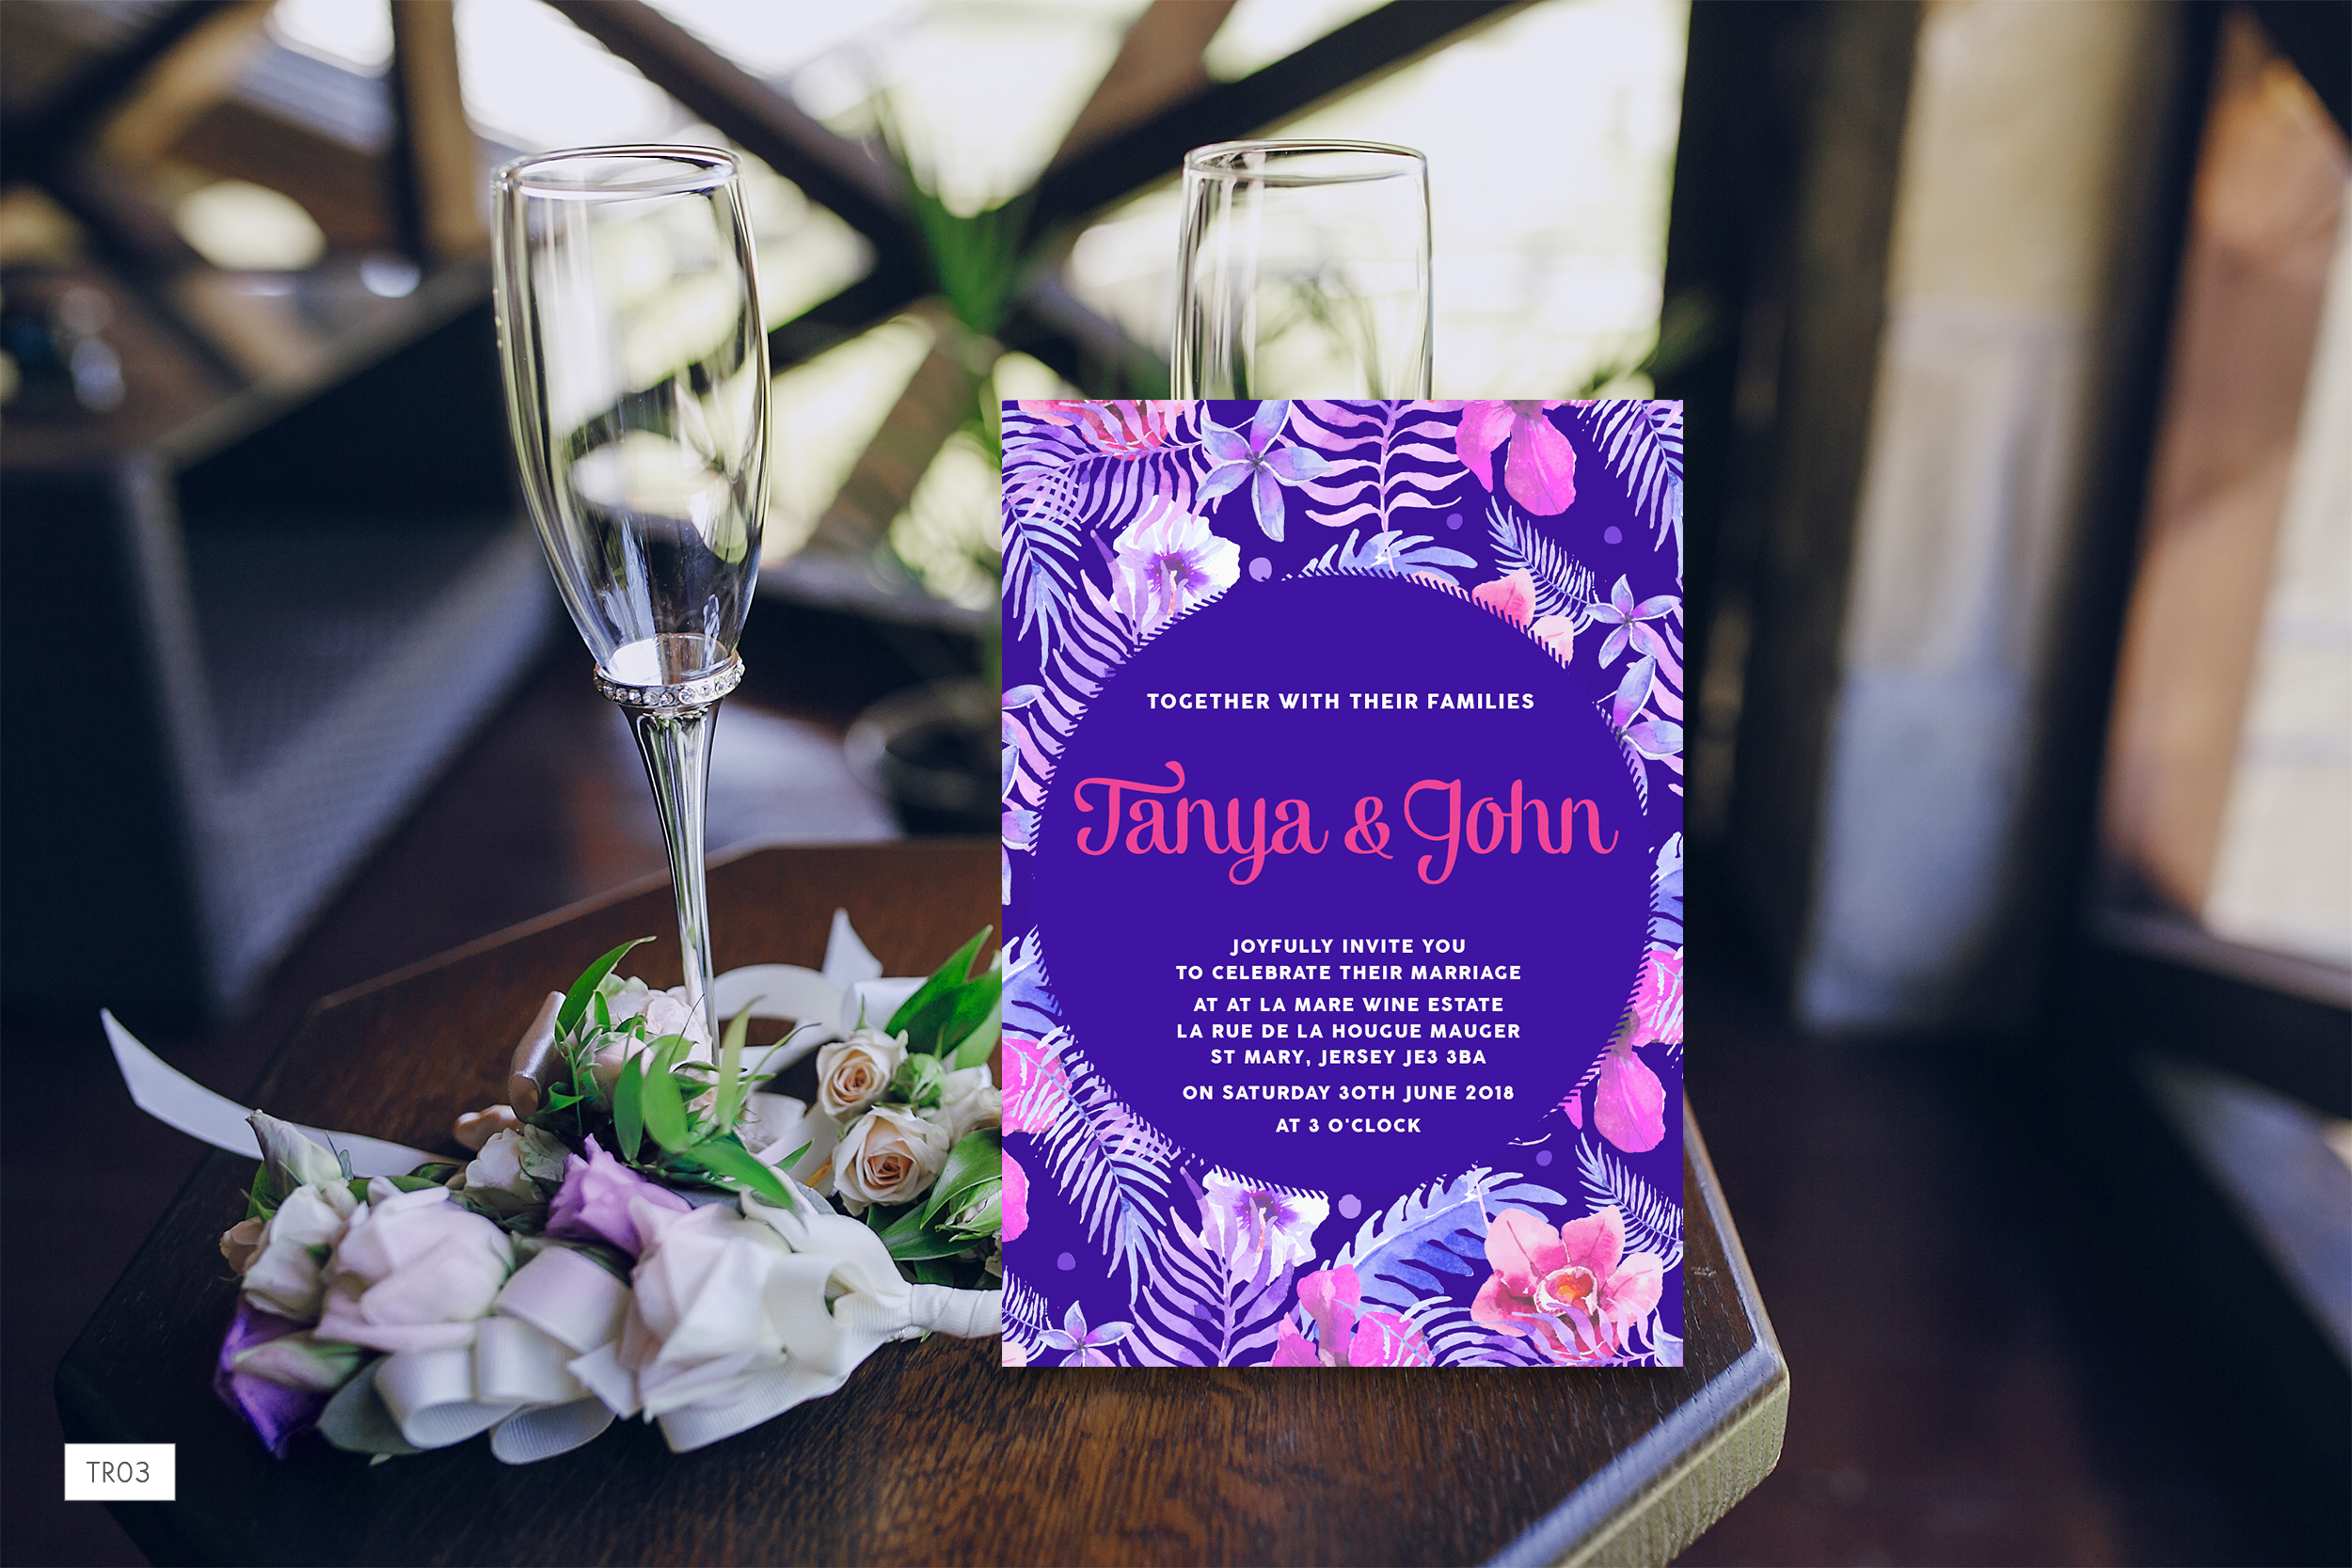 tr03-tropics-wedding-invitation.jpg